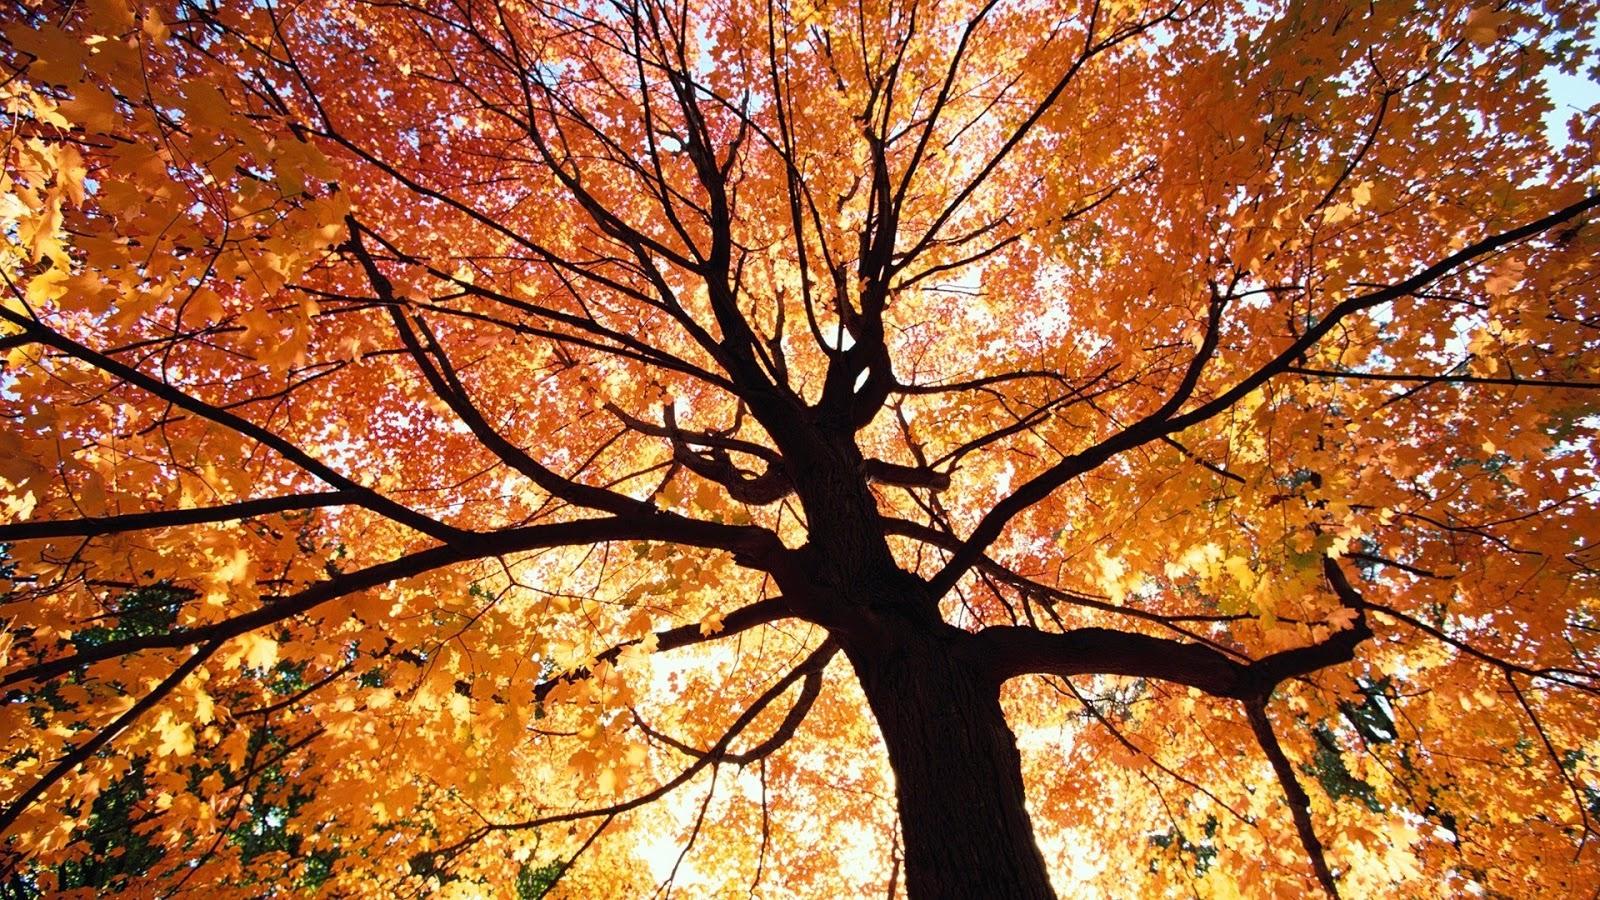 autumn fall tree backgrounds - photo #4